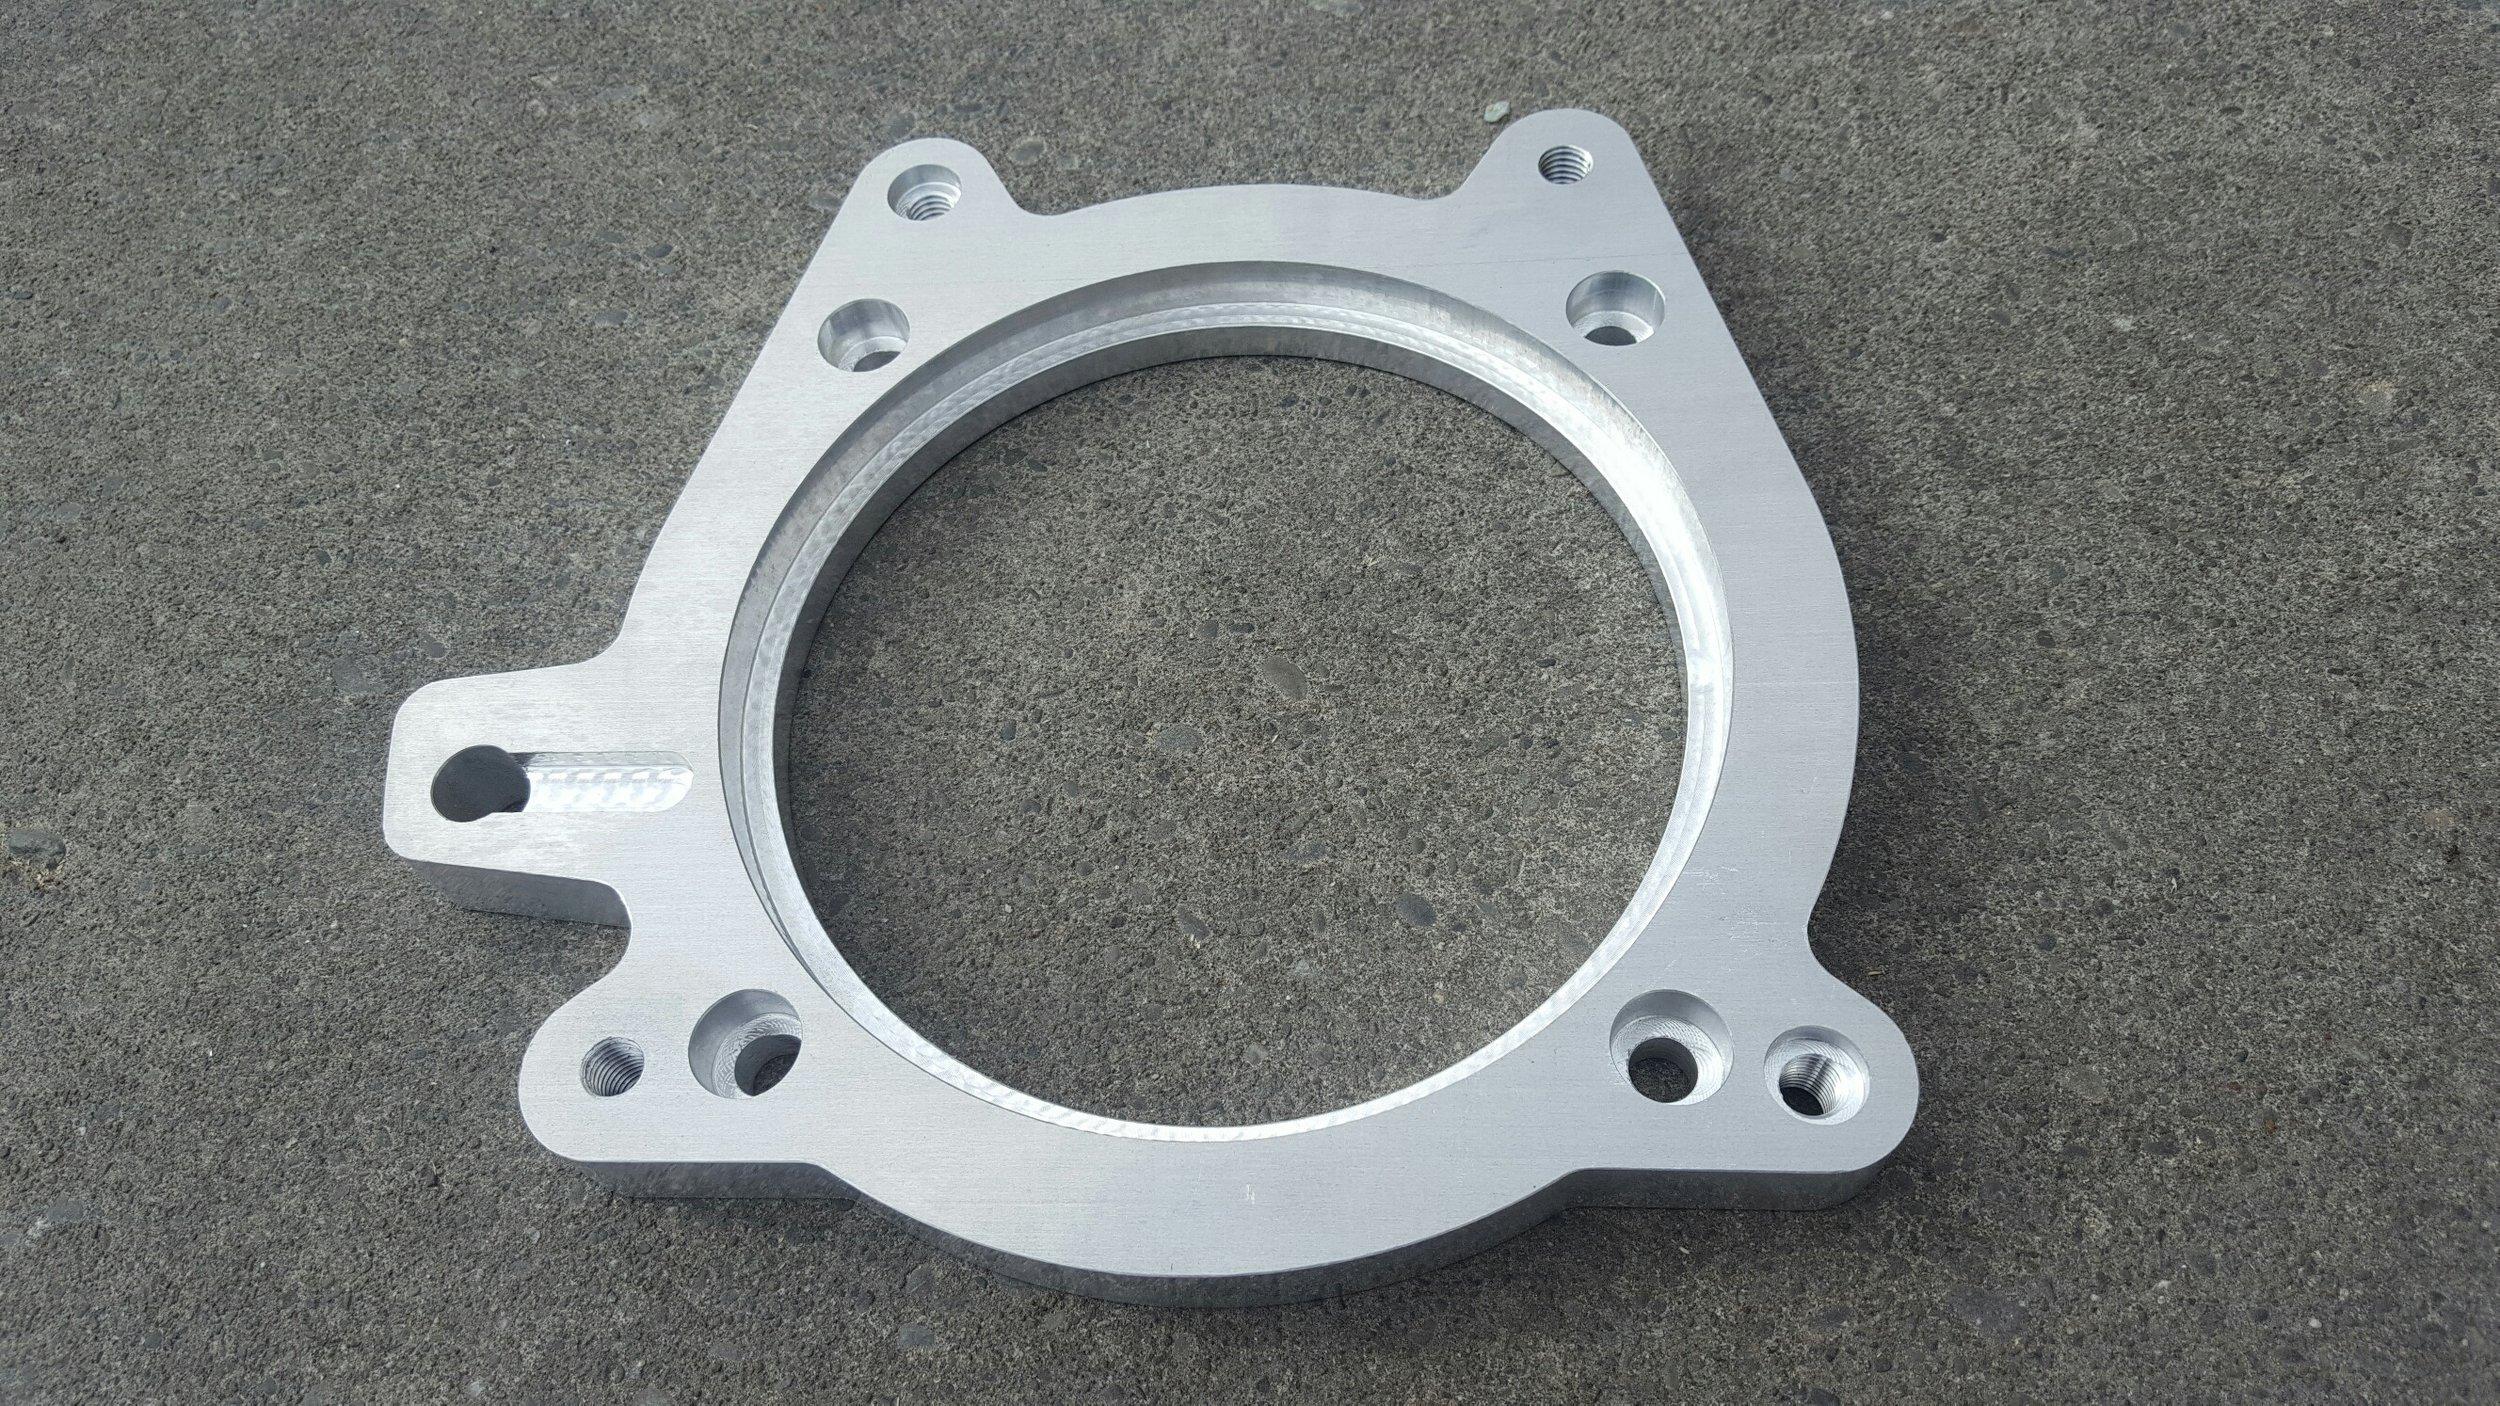 ASPCNC Yamaha pump adaptor (current 155mm pump design).jpg